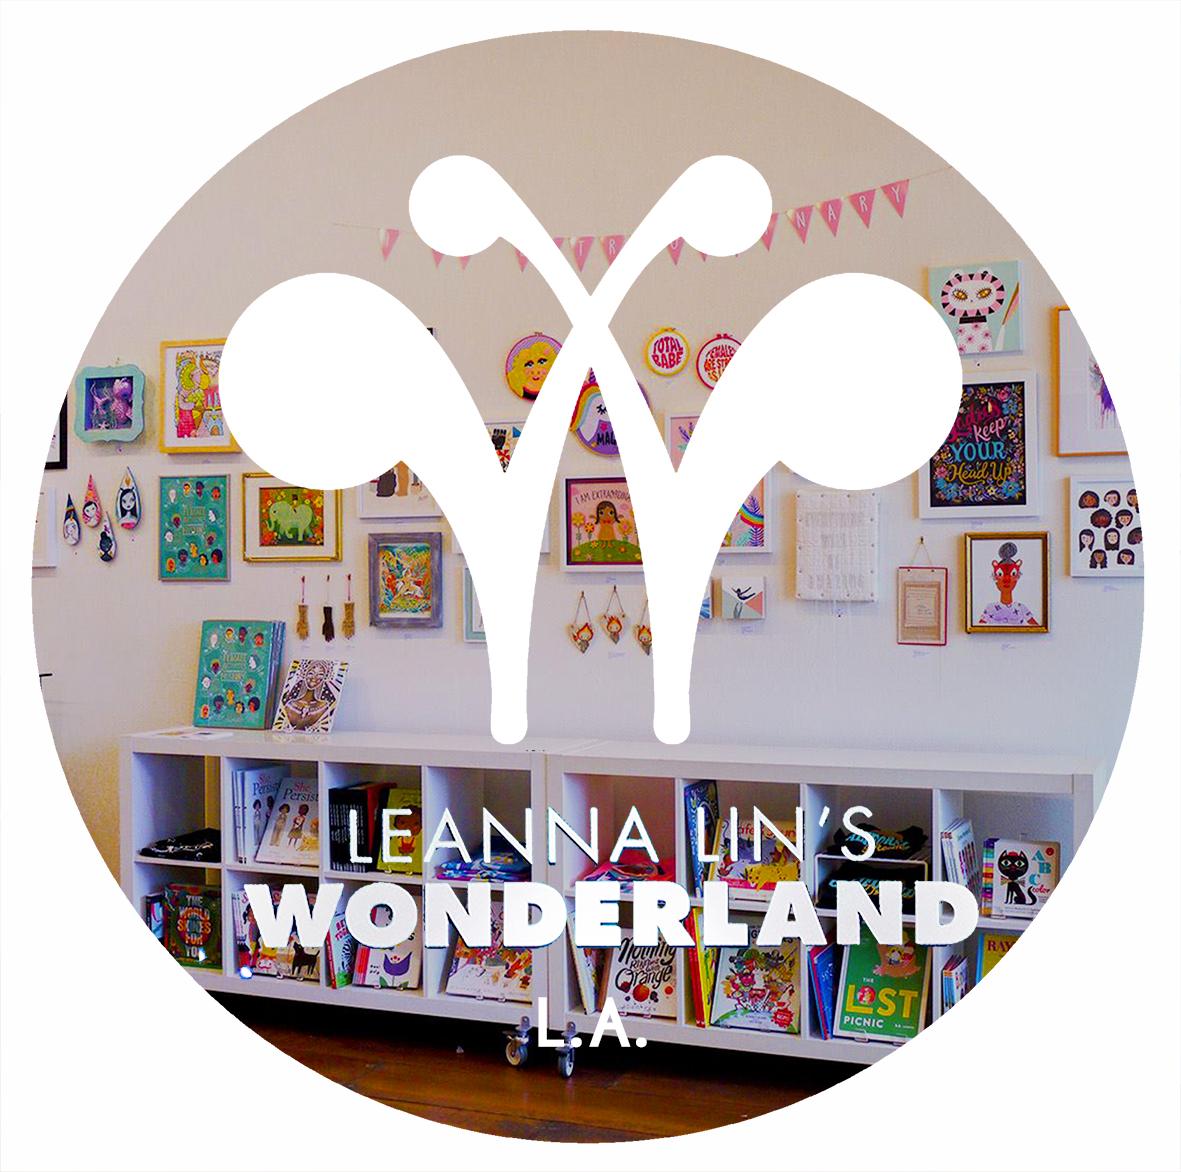 Copy of leanna lin's wonderland